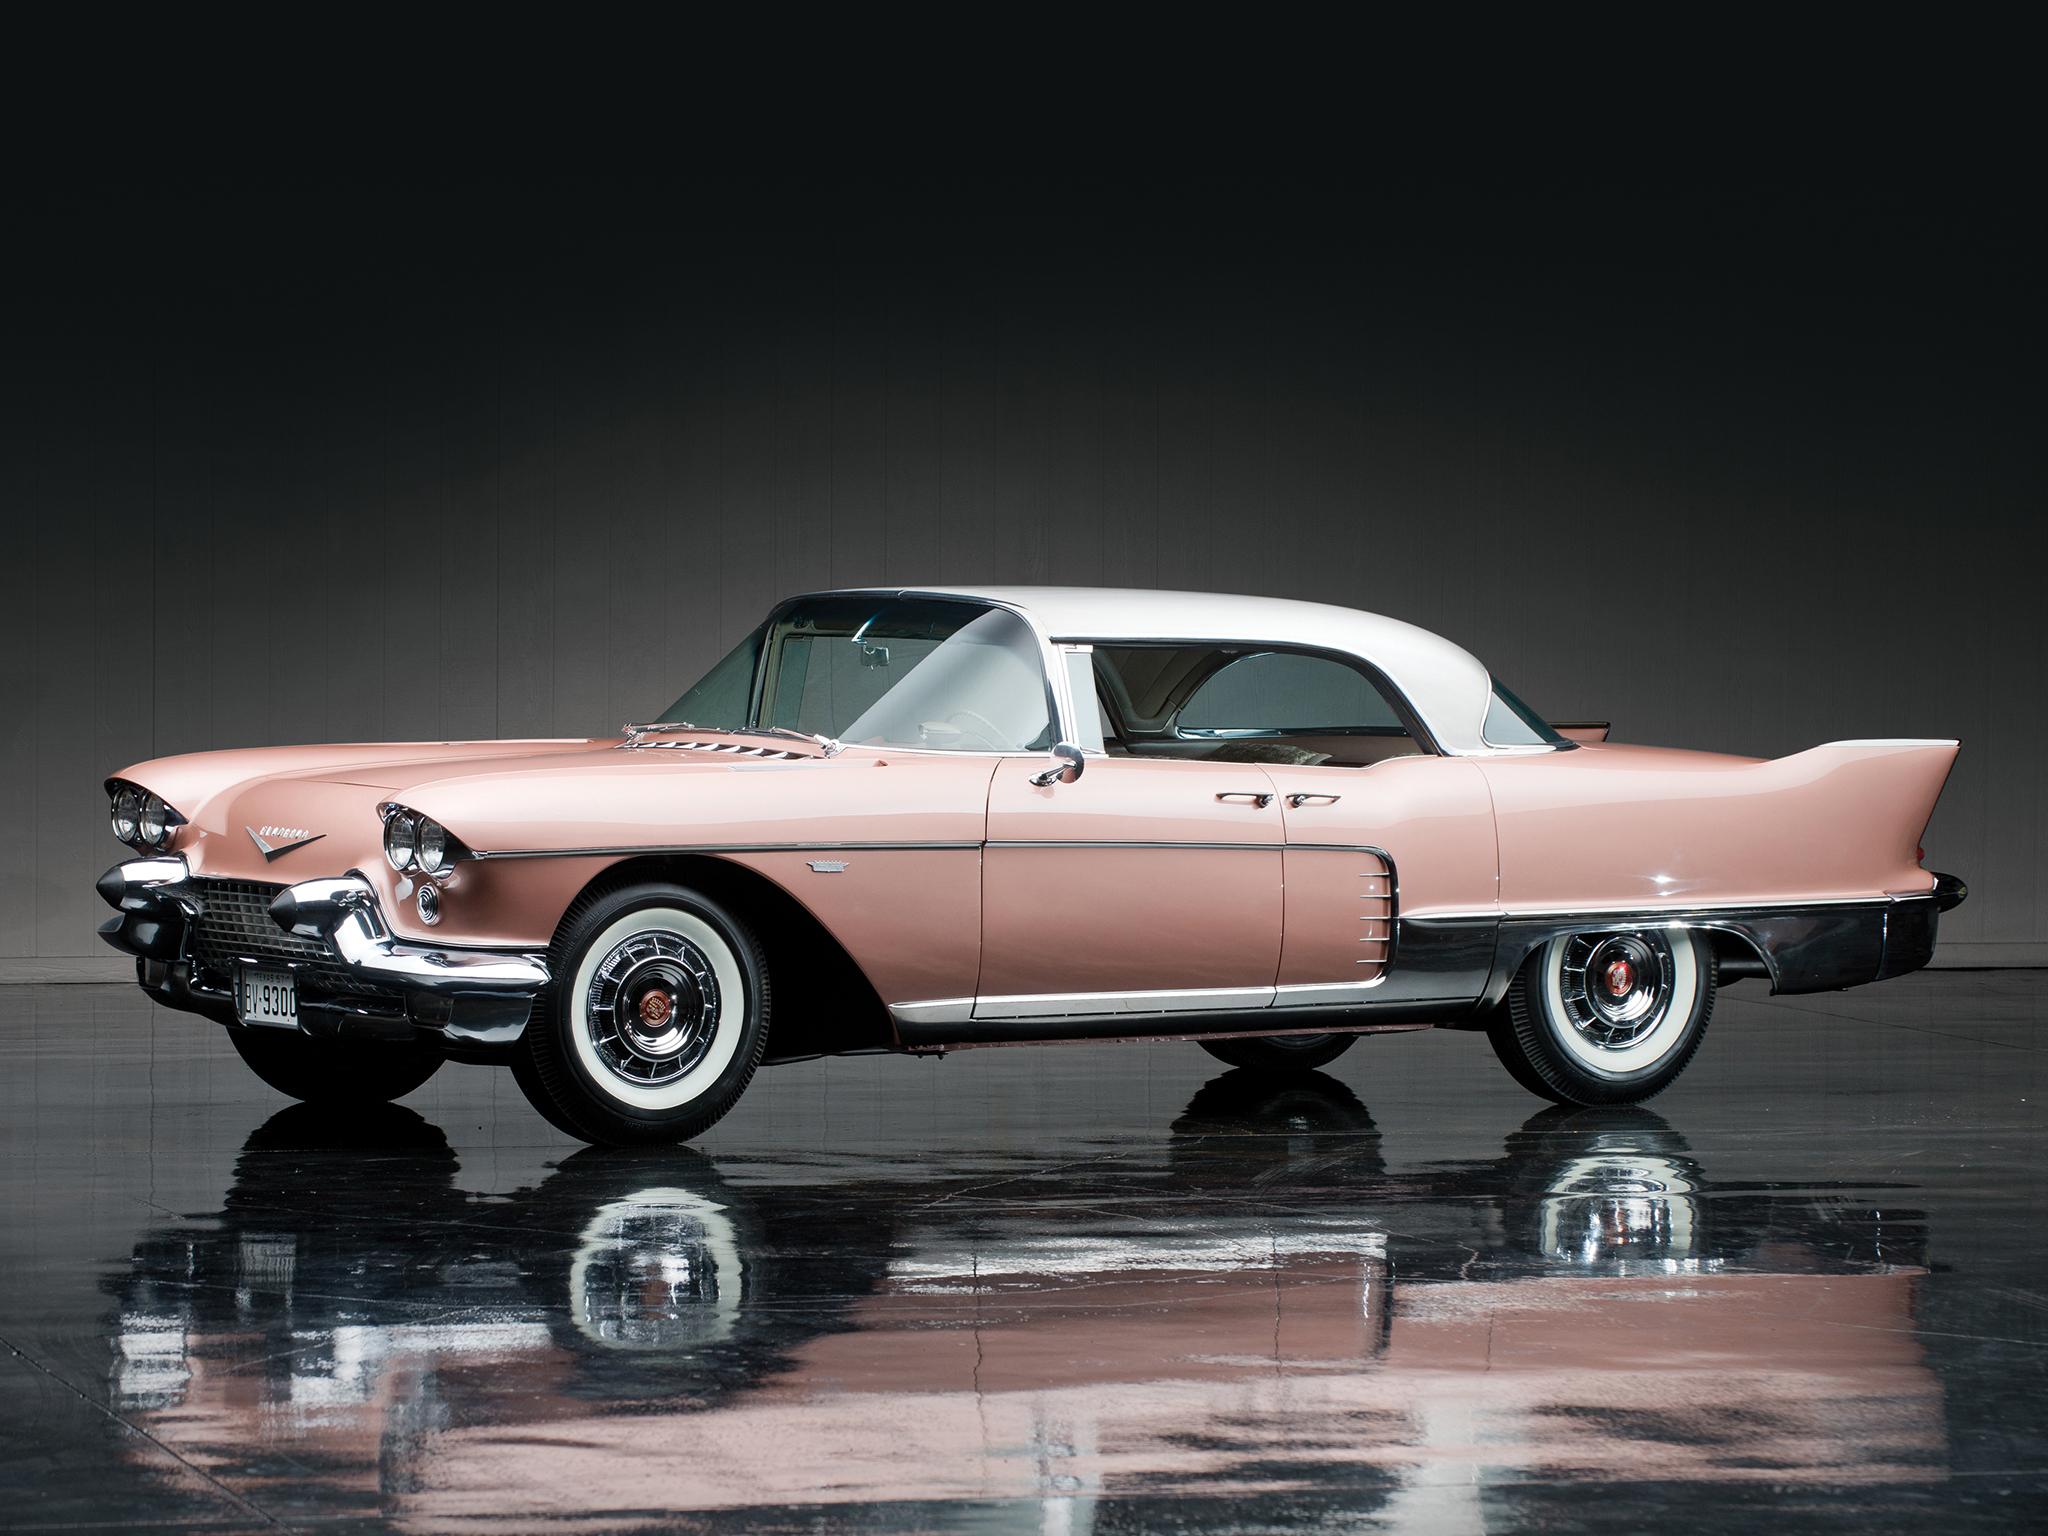 HQ 1958 Cadillac Eldorado Brougham Wallpapers | File 1625.78Kb